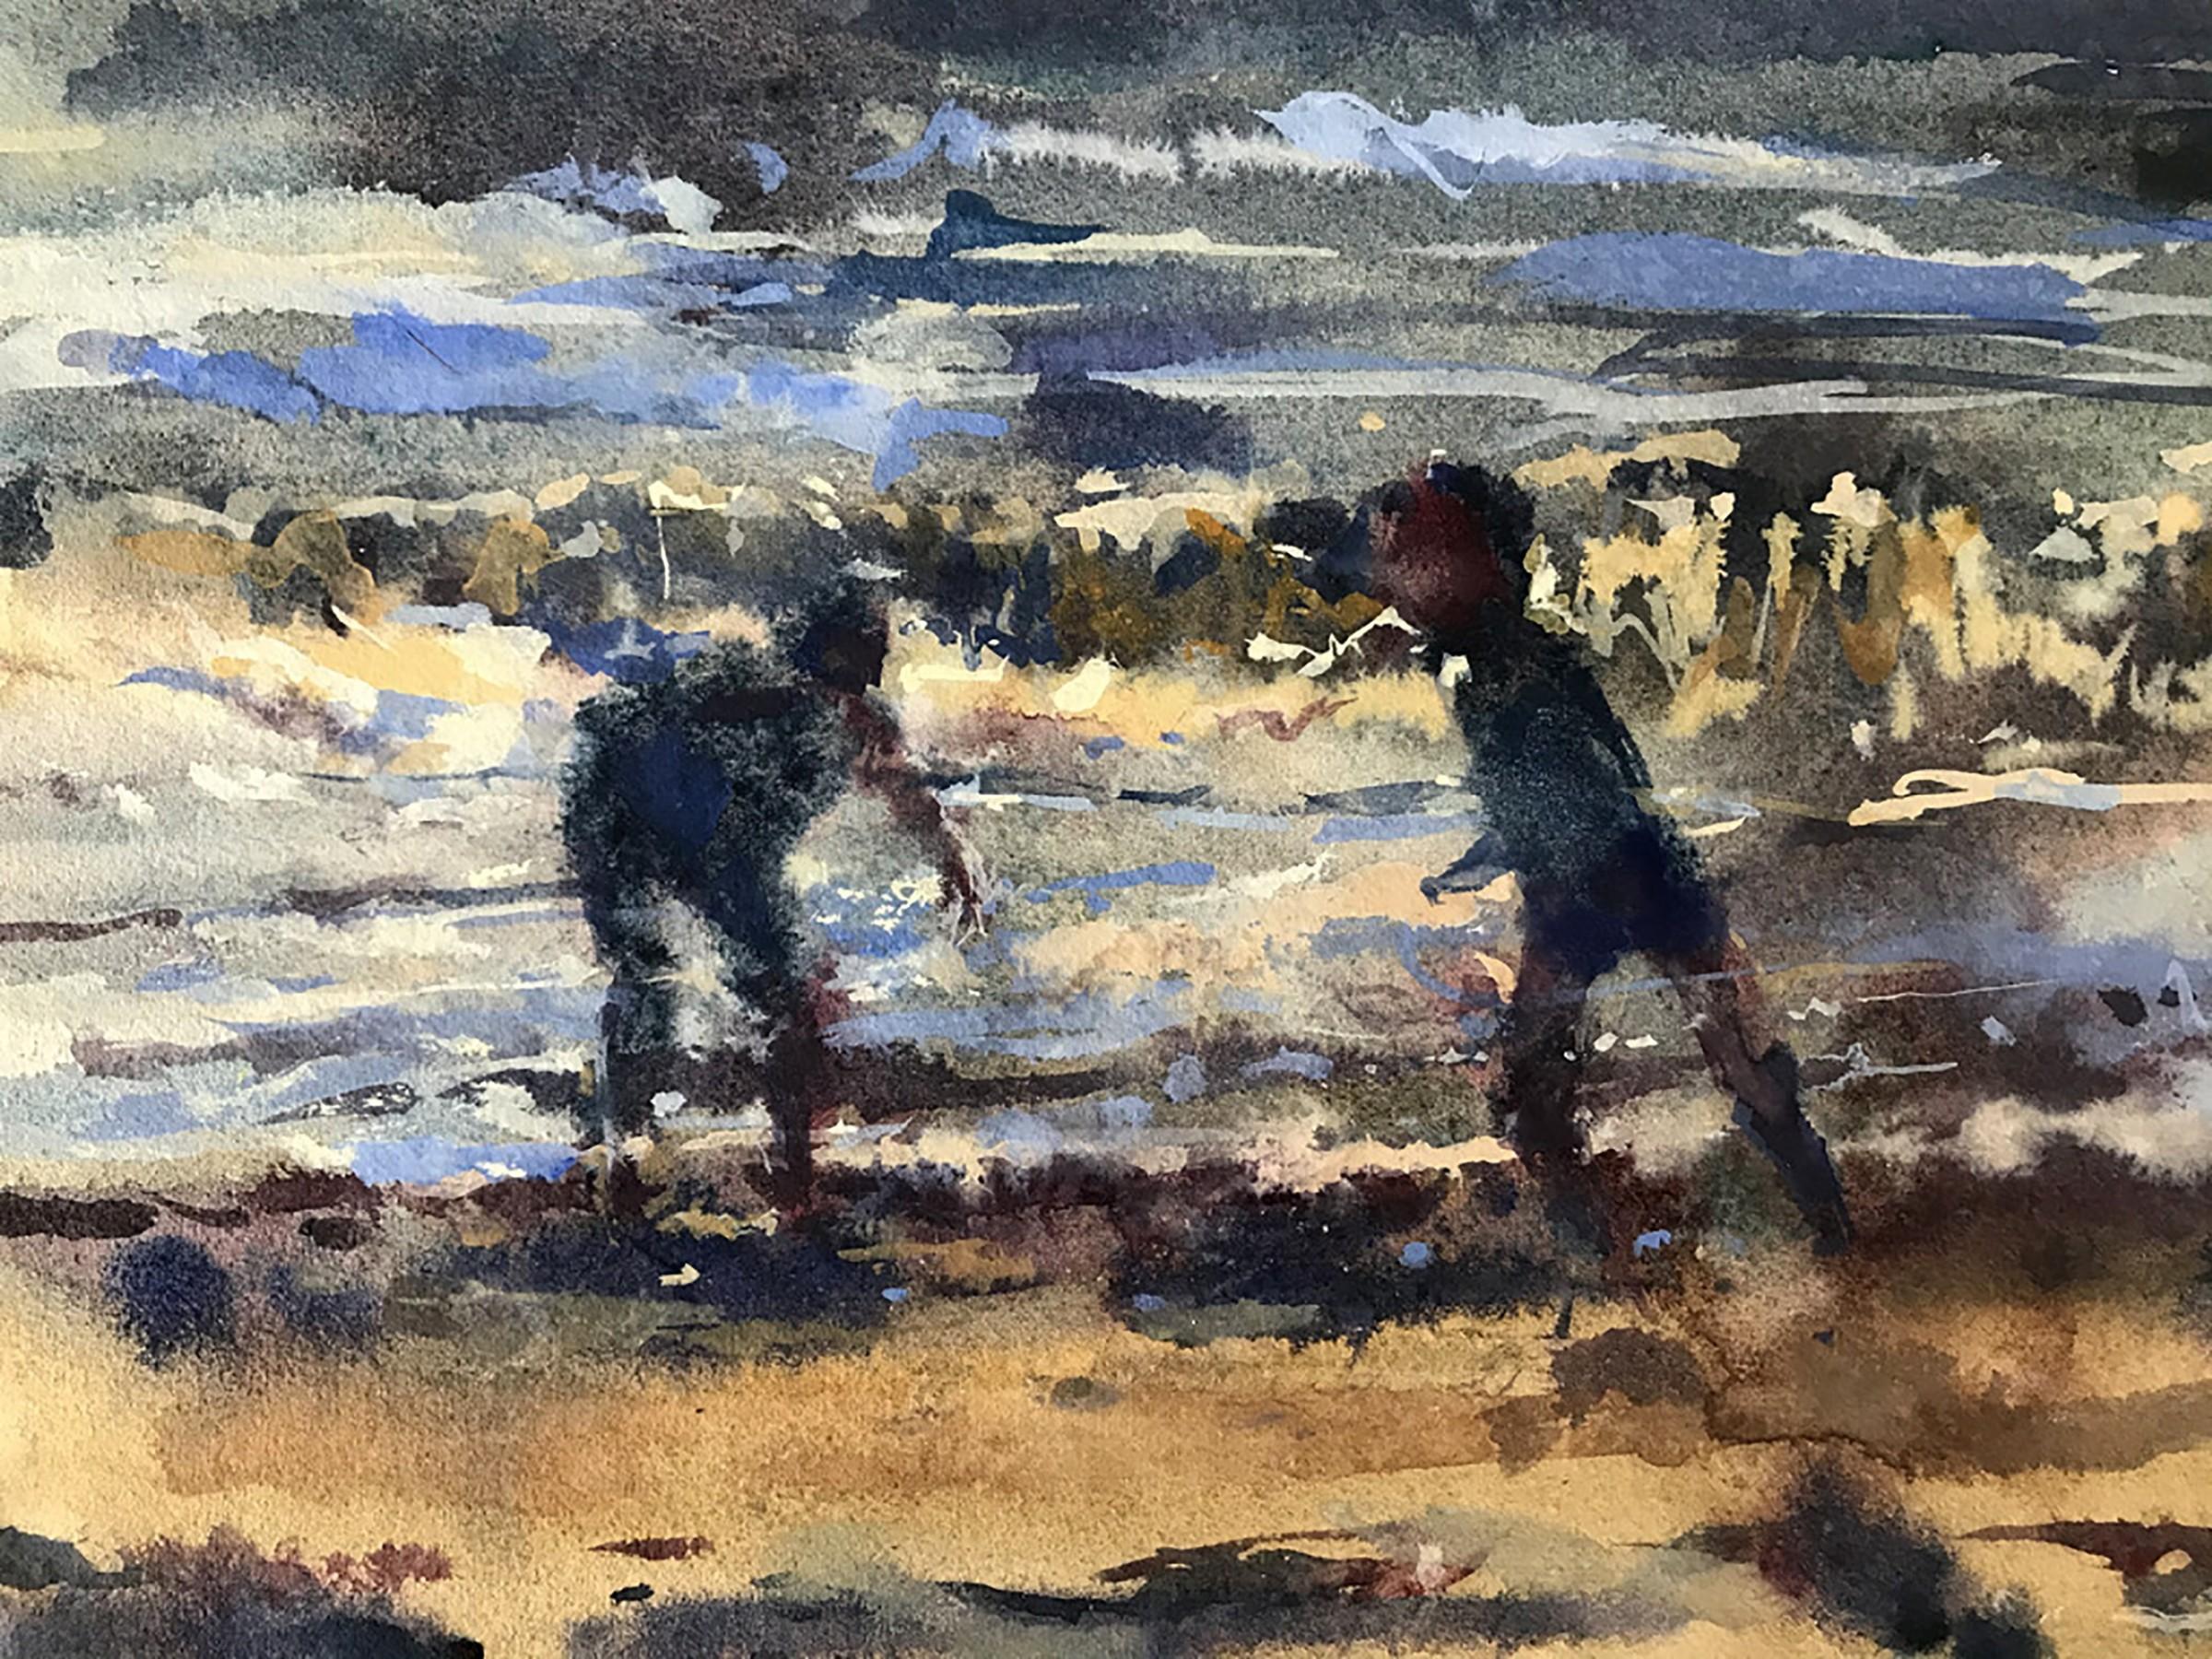 "<span class=""link fancybox-details-link""><a href=""/artists/46-francis-bowyer/works/12688-francis-bowyer-beach-play/"">View Detail Page</a></span><div class=""artist""><span class=""artist""><strong>Francis Bowyer</strong></span></div><div class=""title""><em>Beach Play</em></div><div class=""medium"">watercolour & bodycolour</div><div class=""dimensions"">Artwork: 40 x 33cm</div><div class=""price"">£850.00</div>"